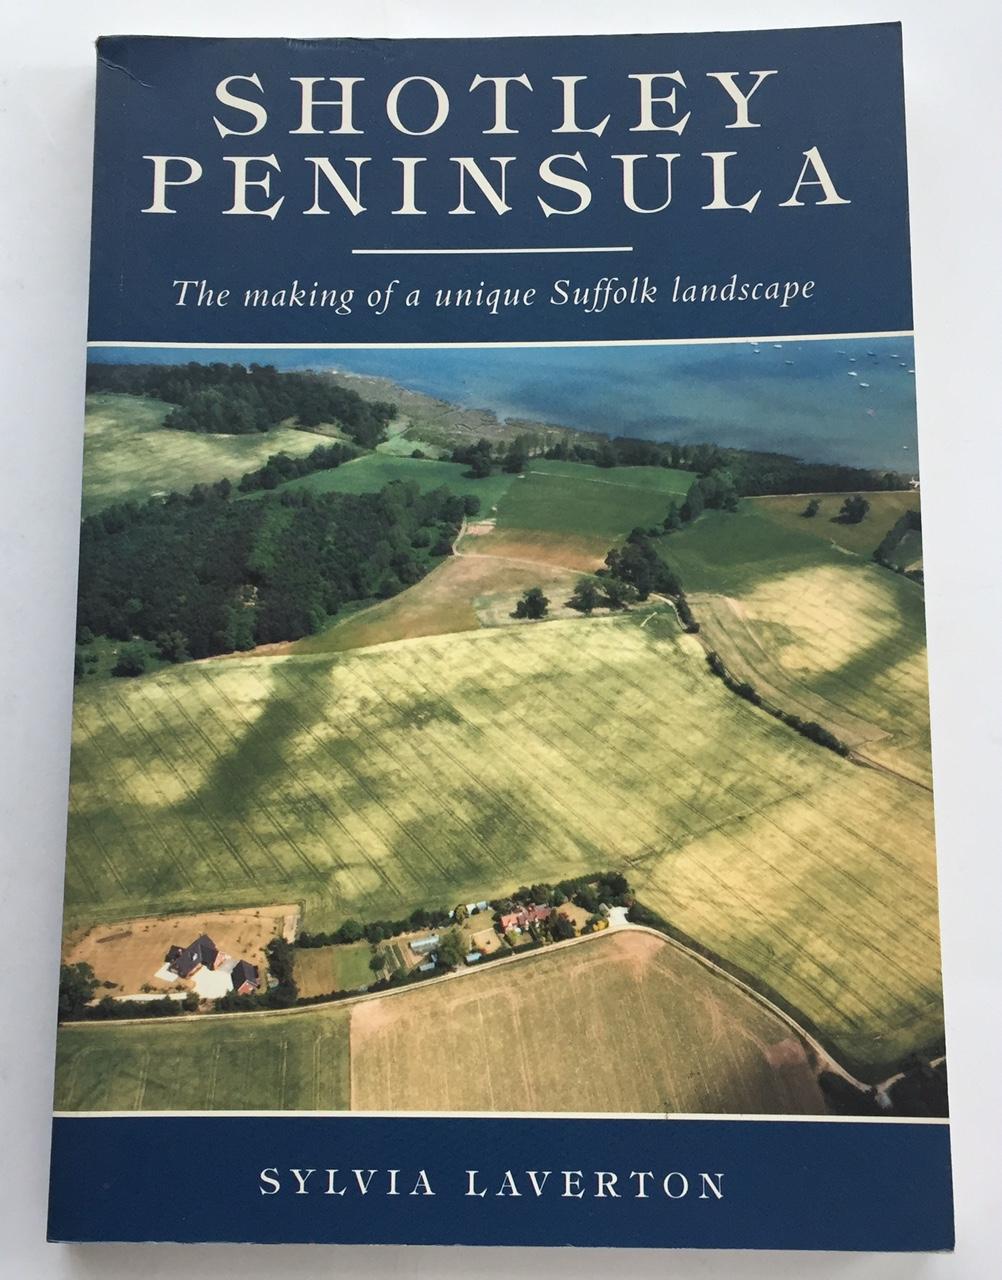 Shotley Peninsula :The making of a unique Suffolk landscape, Laverton, Sylvia ;